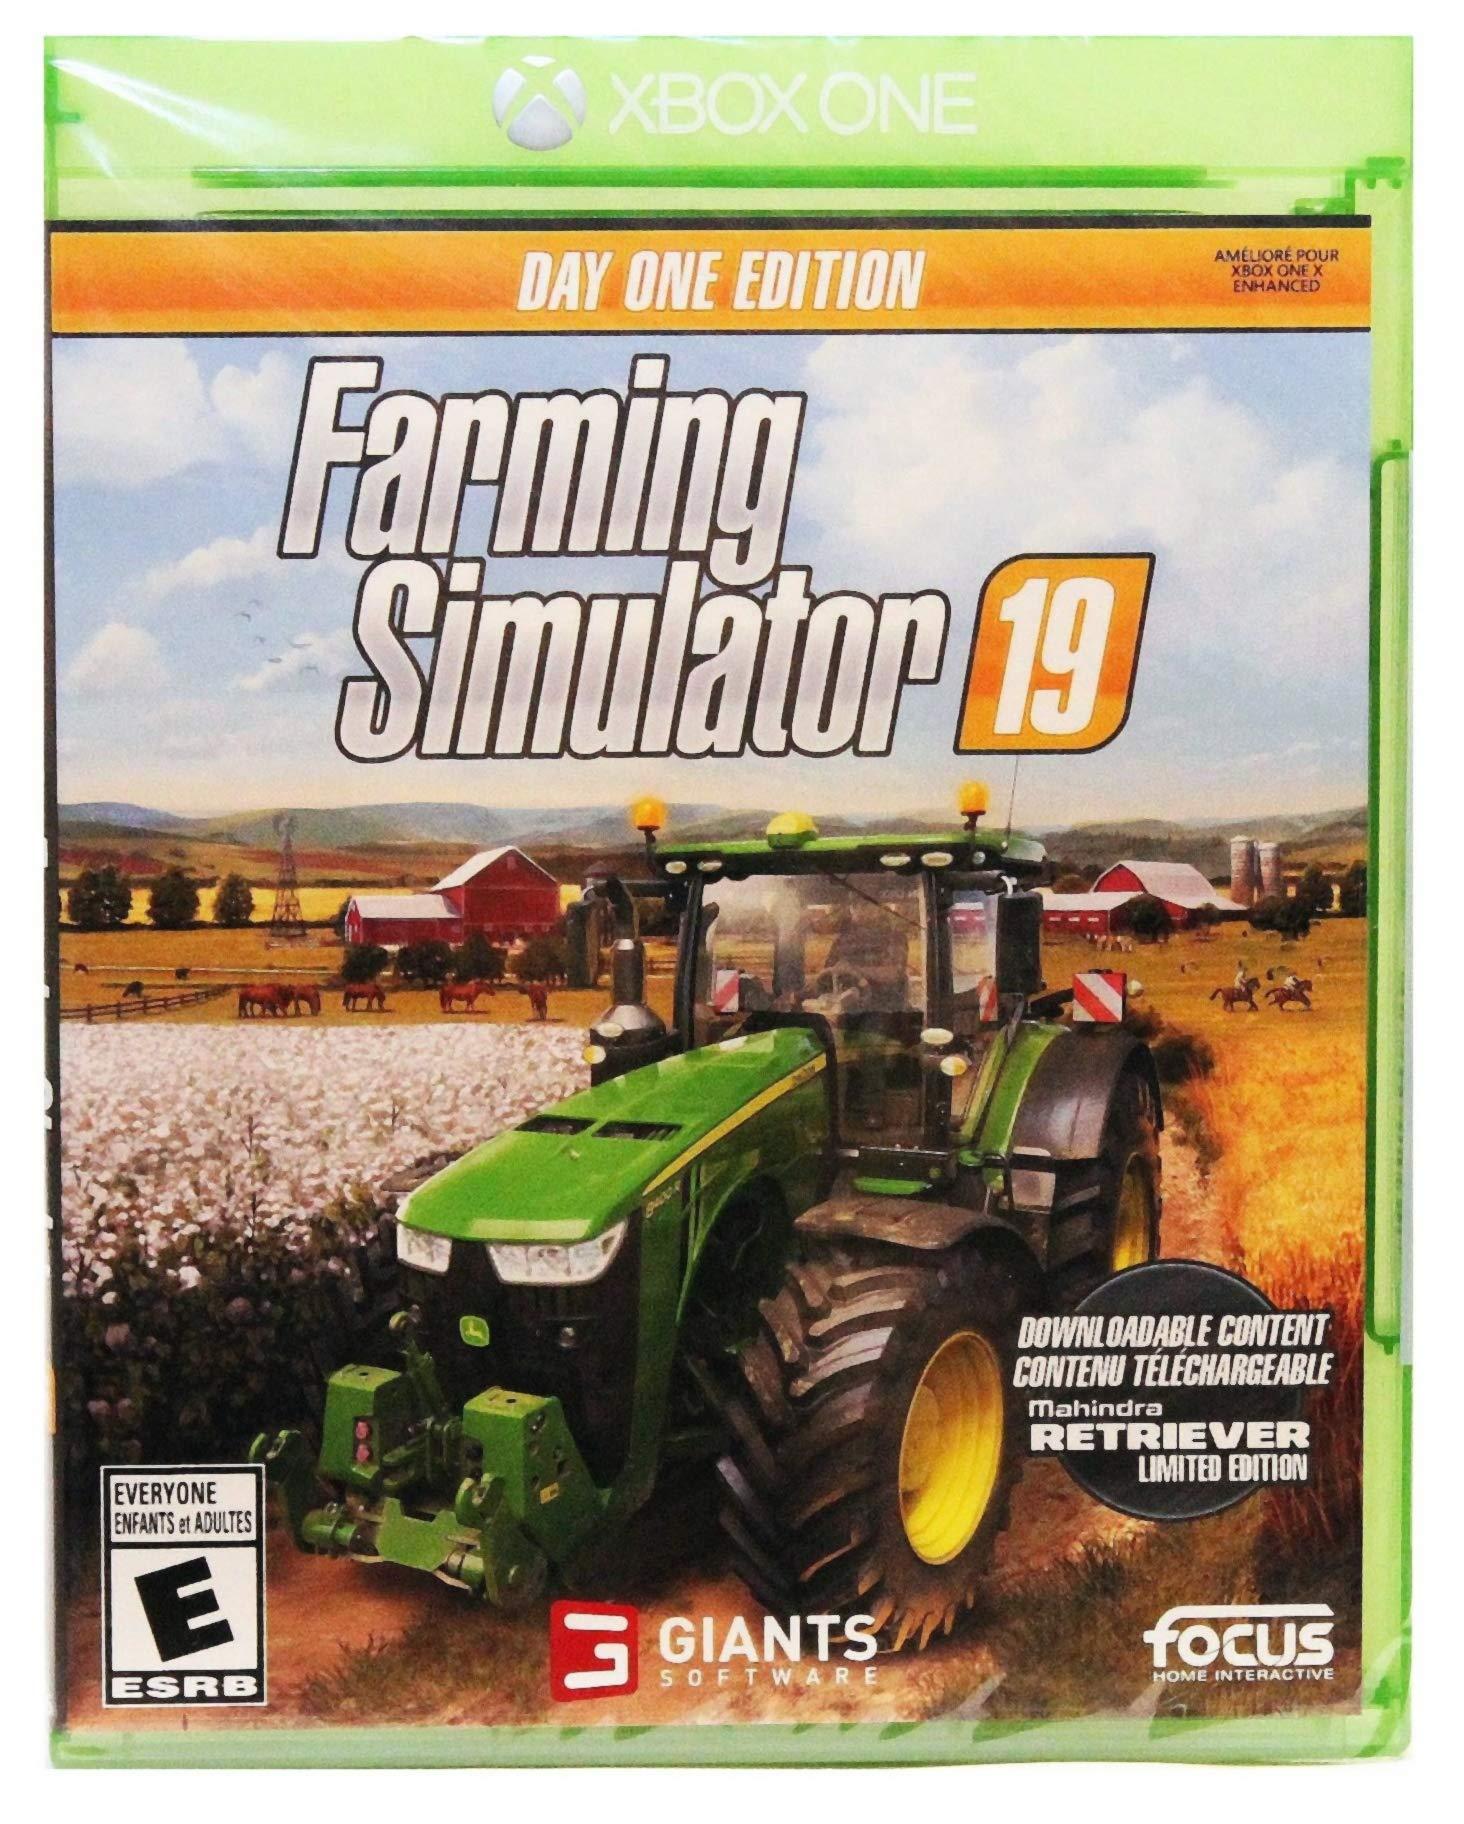 Farming Simulator 19 - Day One Edition Xbox One [US Version] - Mahindra Retriever DLC